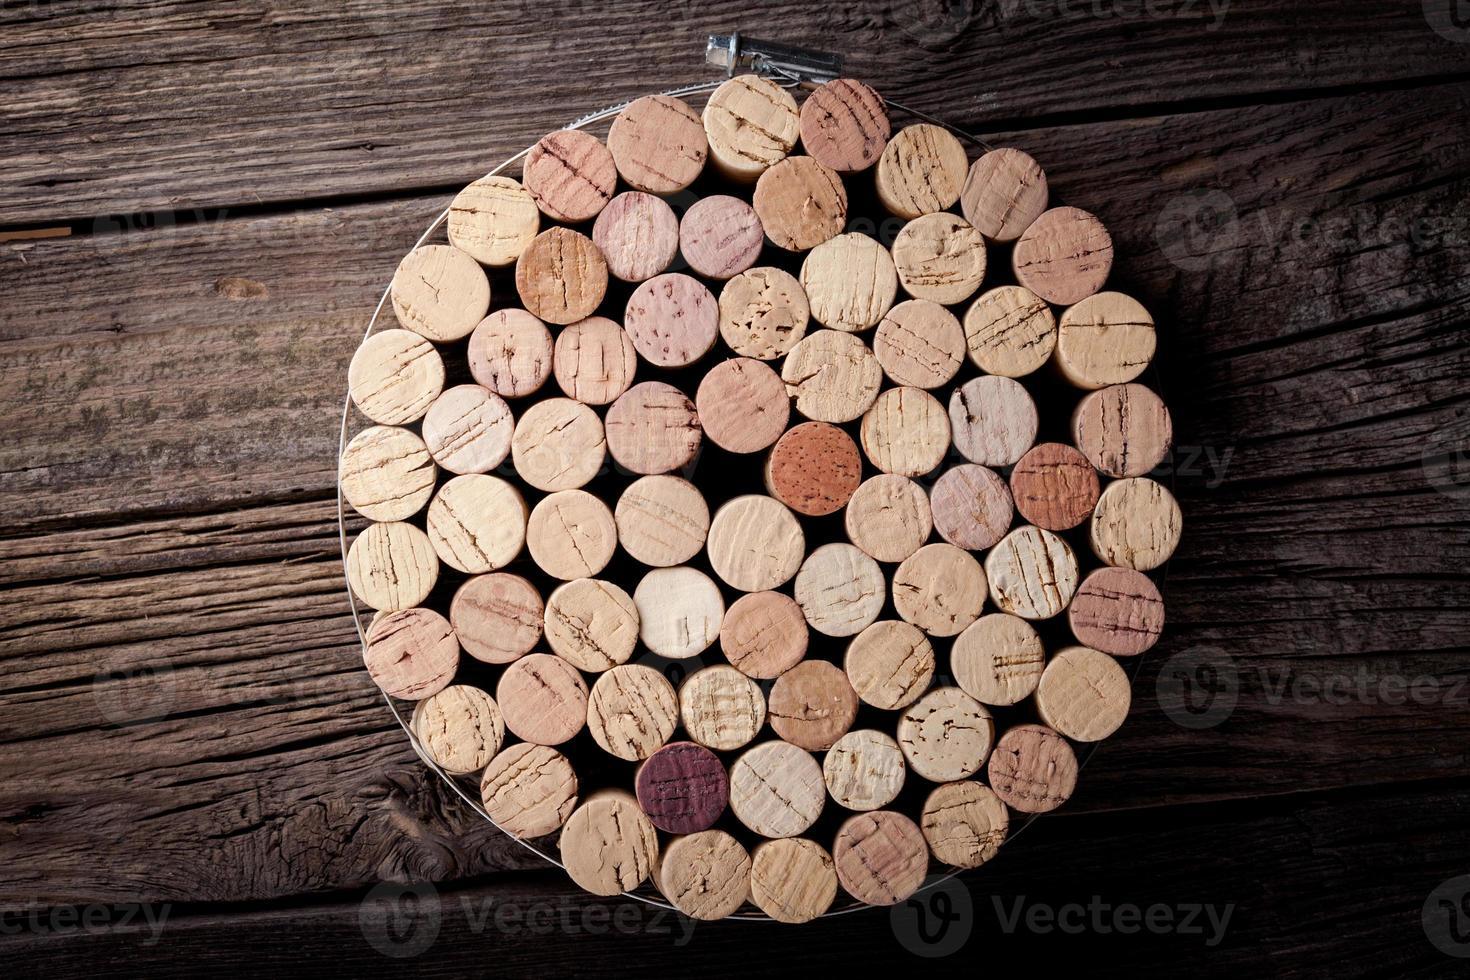 Diy homemade cork protector from hot pots photo